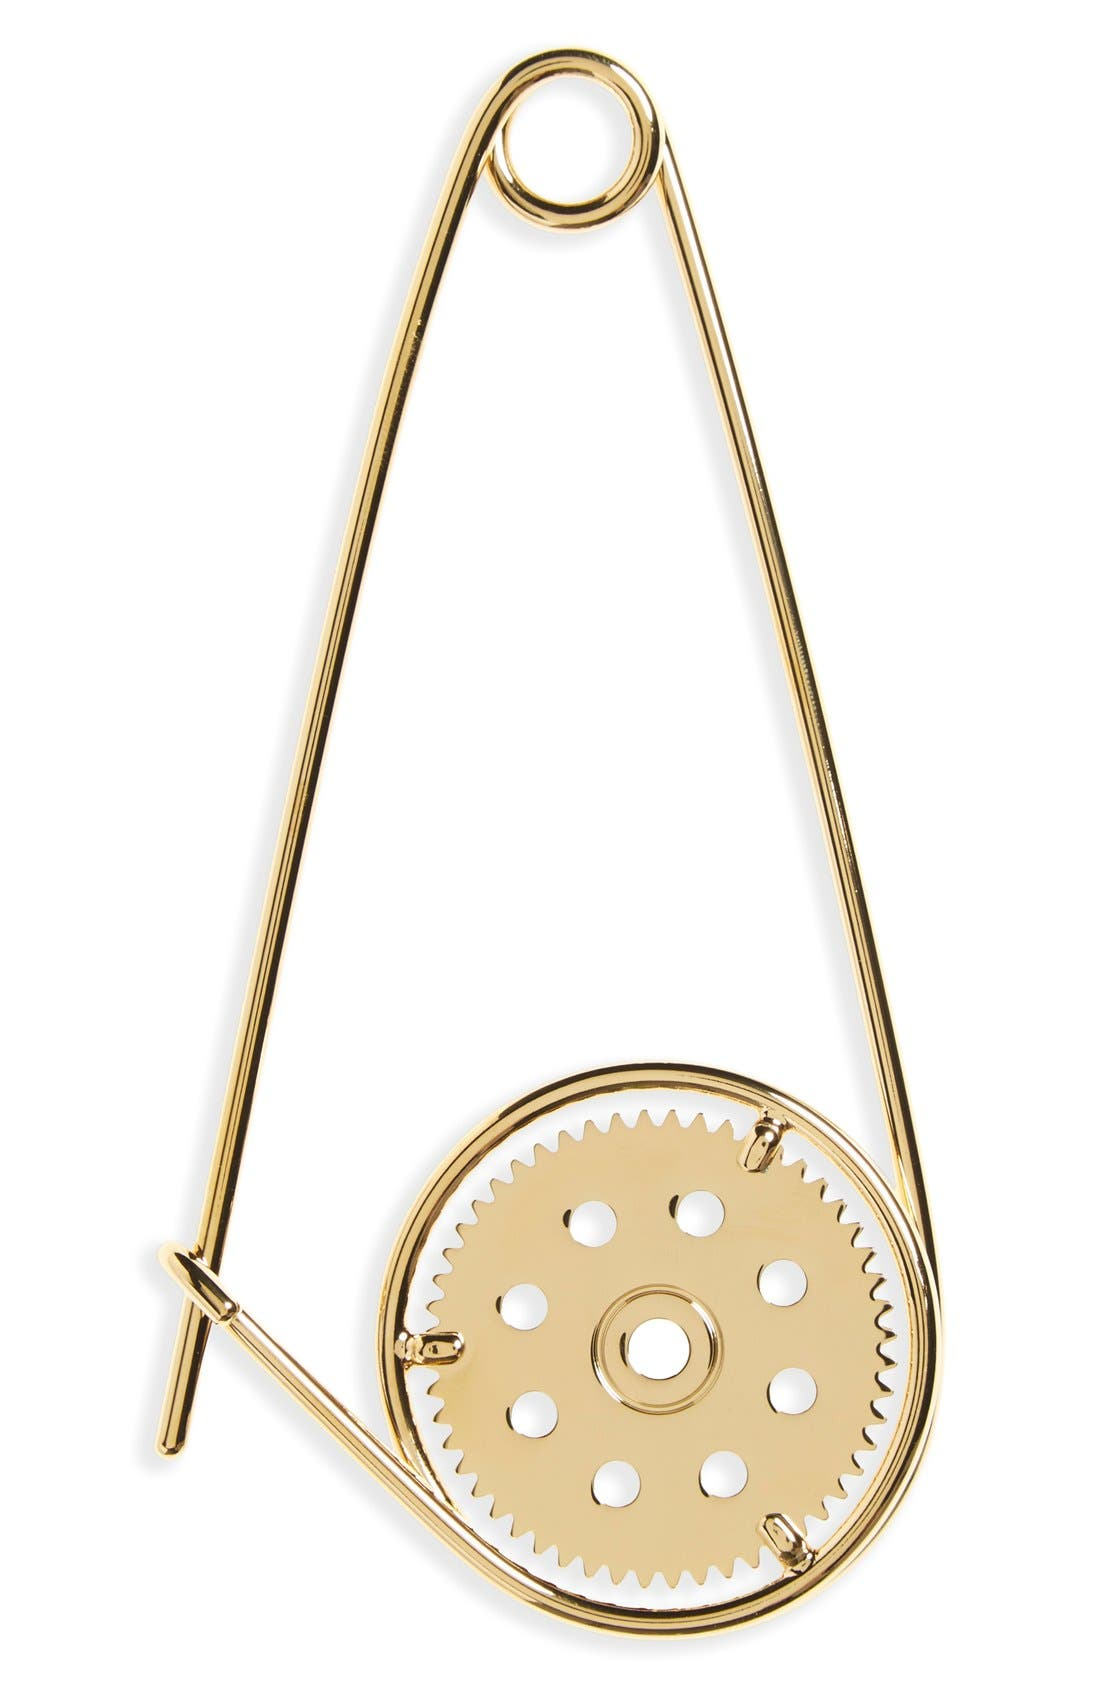 Loewe 'Meccano' Pin Bag Charm